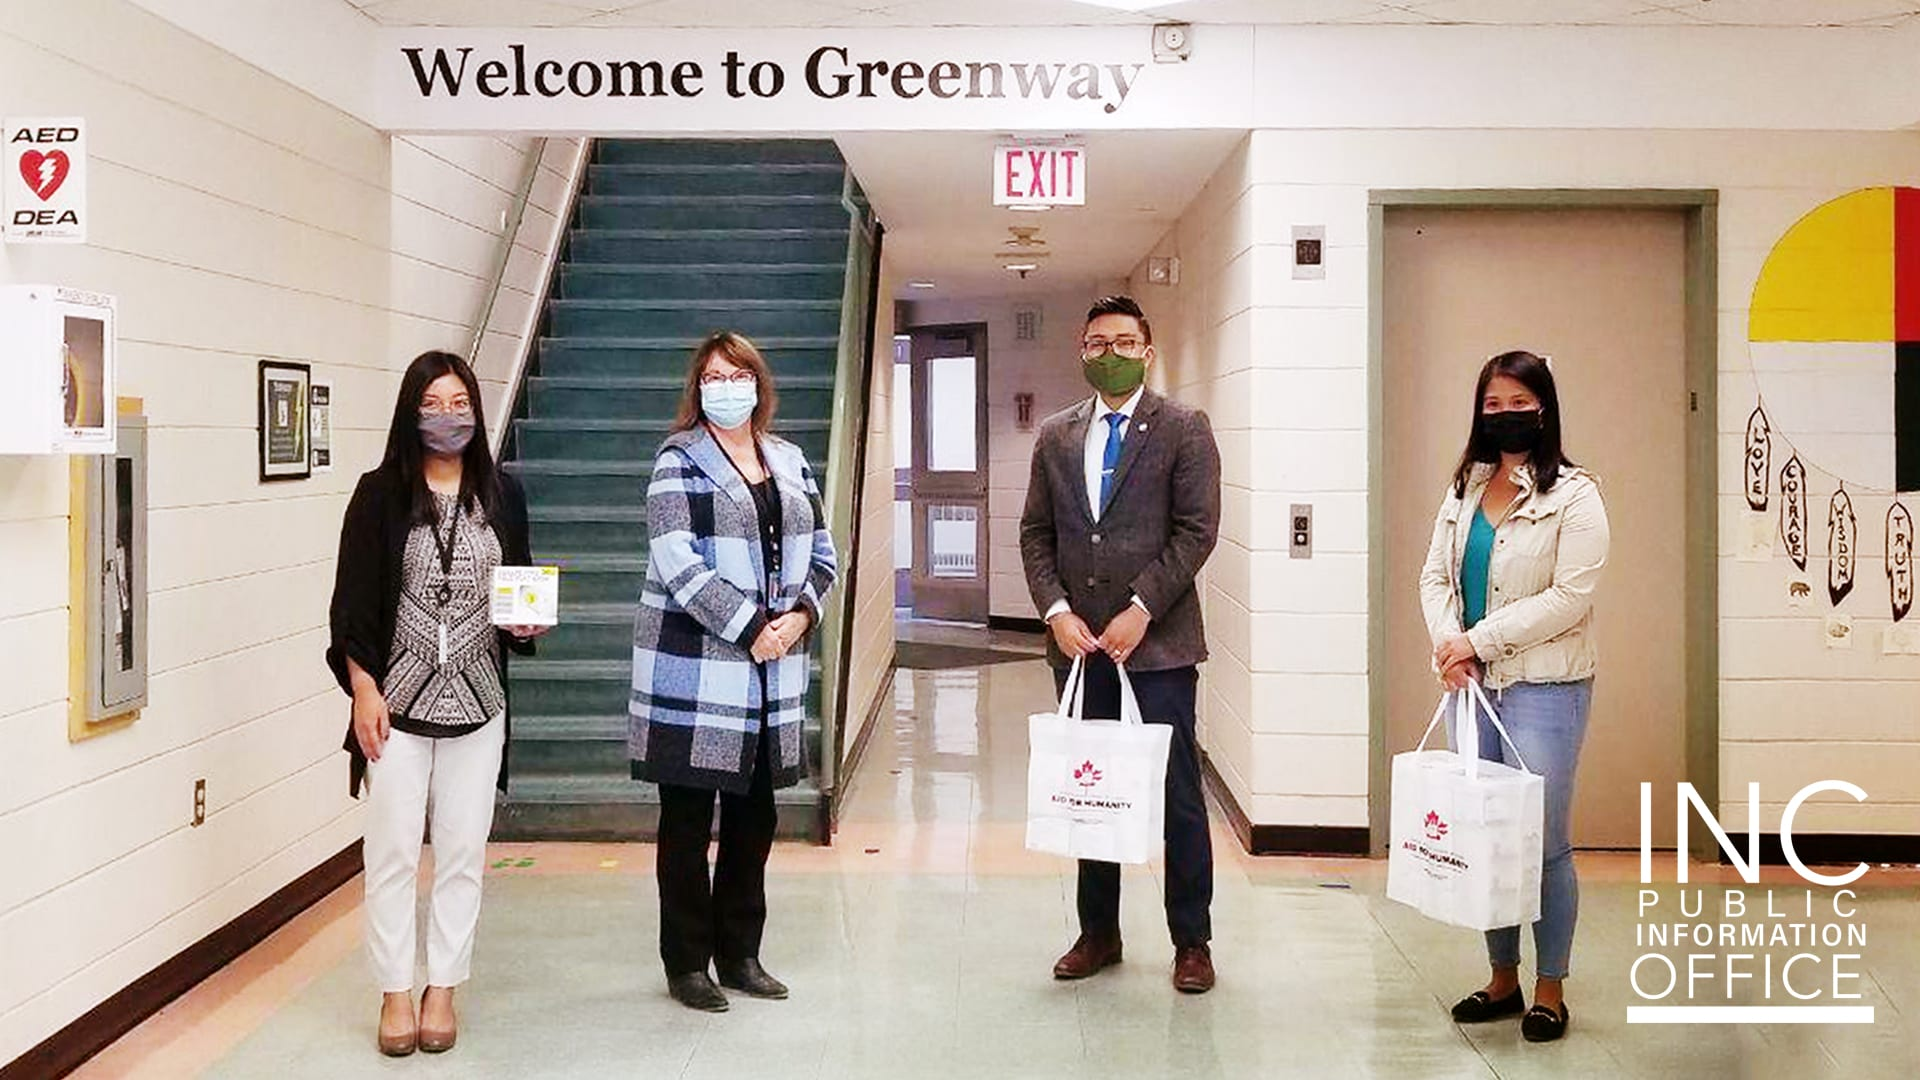 Iglesia Ni Cristo Donates 10,000 Face Masks to Students of 12 Schools in Southern Canada